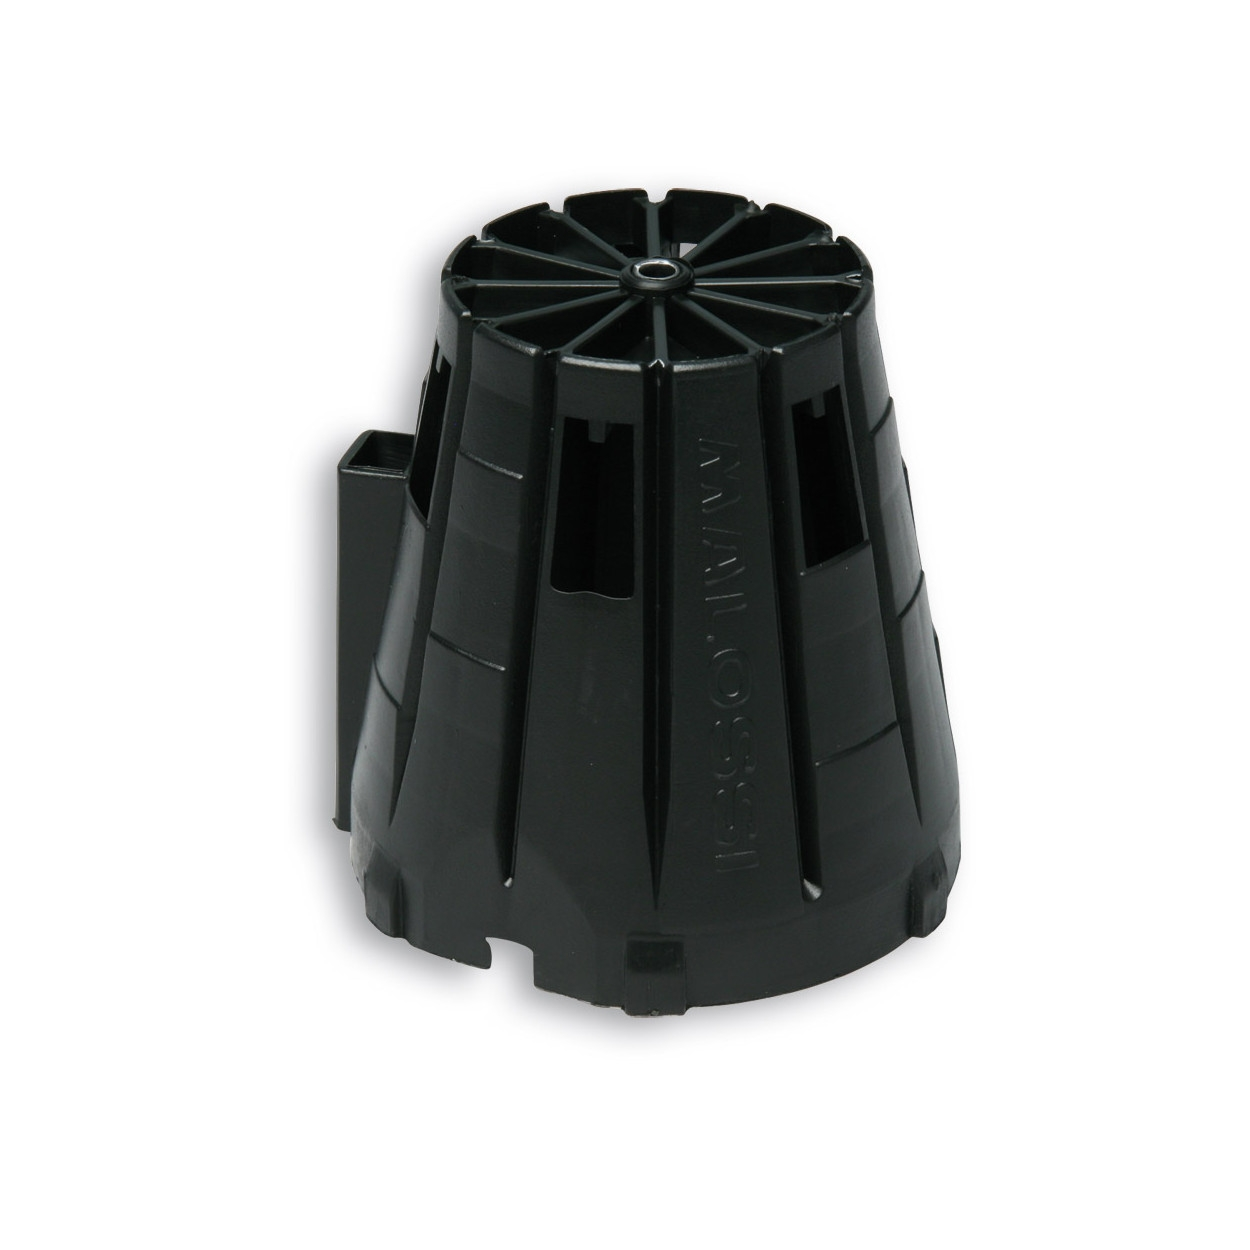 Couvercle de filtre a air Malossi E5 noir